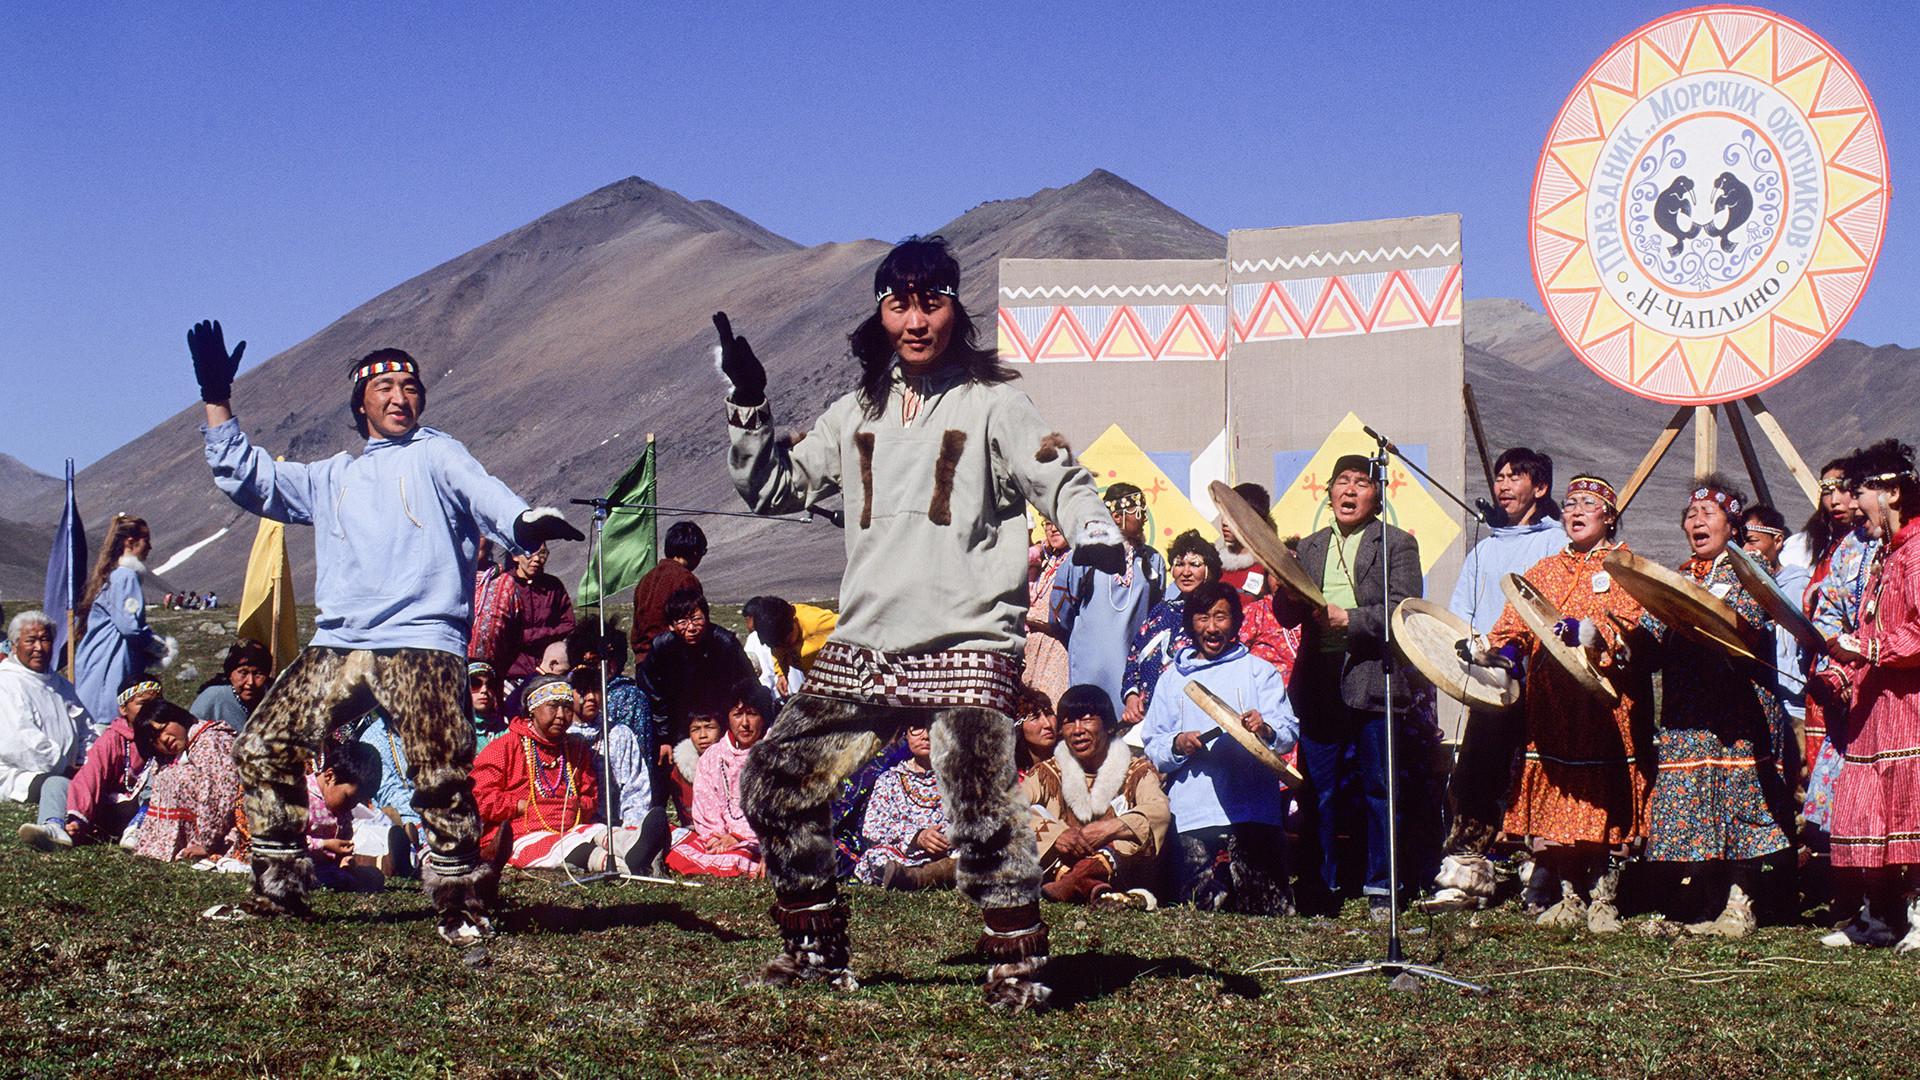 Tradicionalne igre na festivalu lova